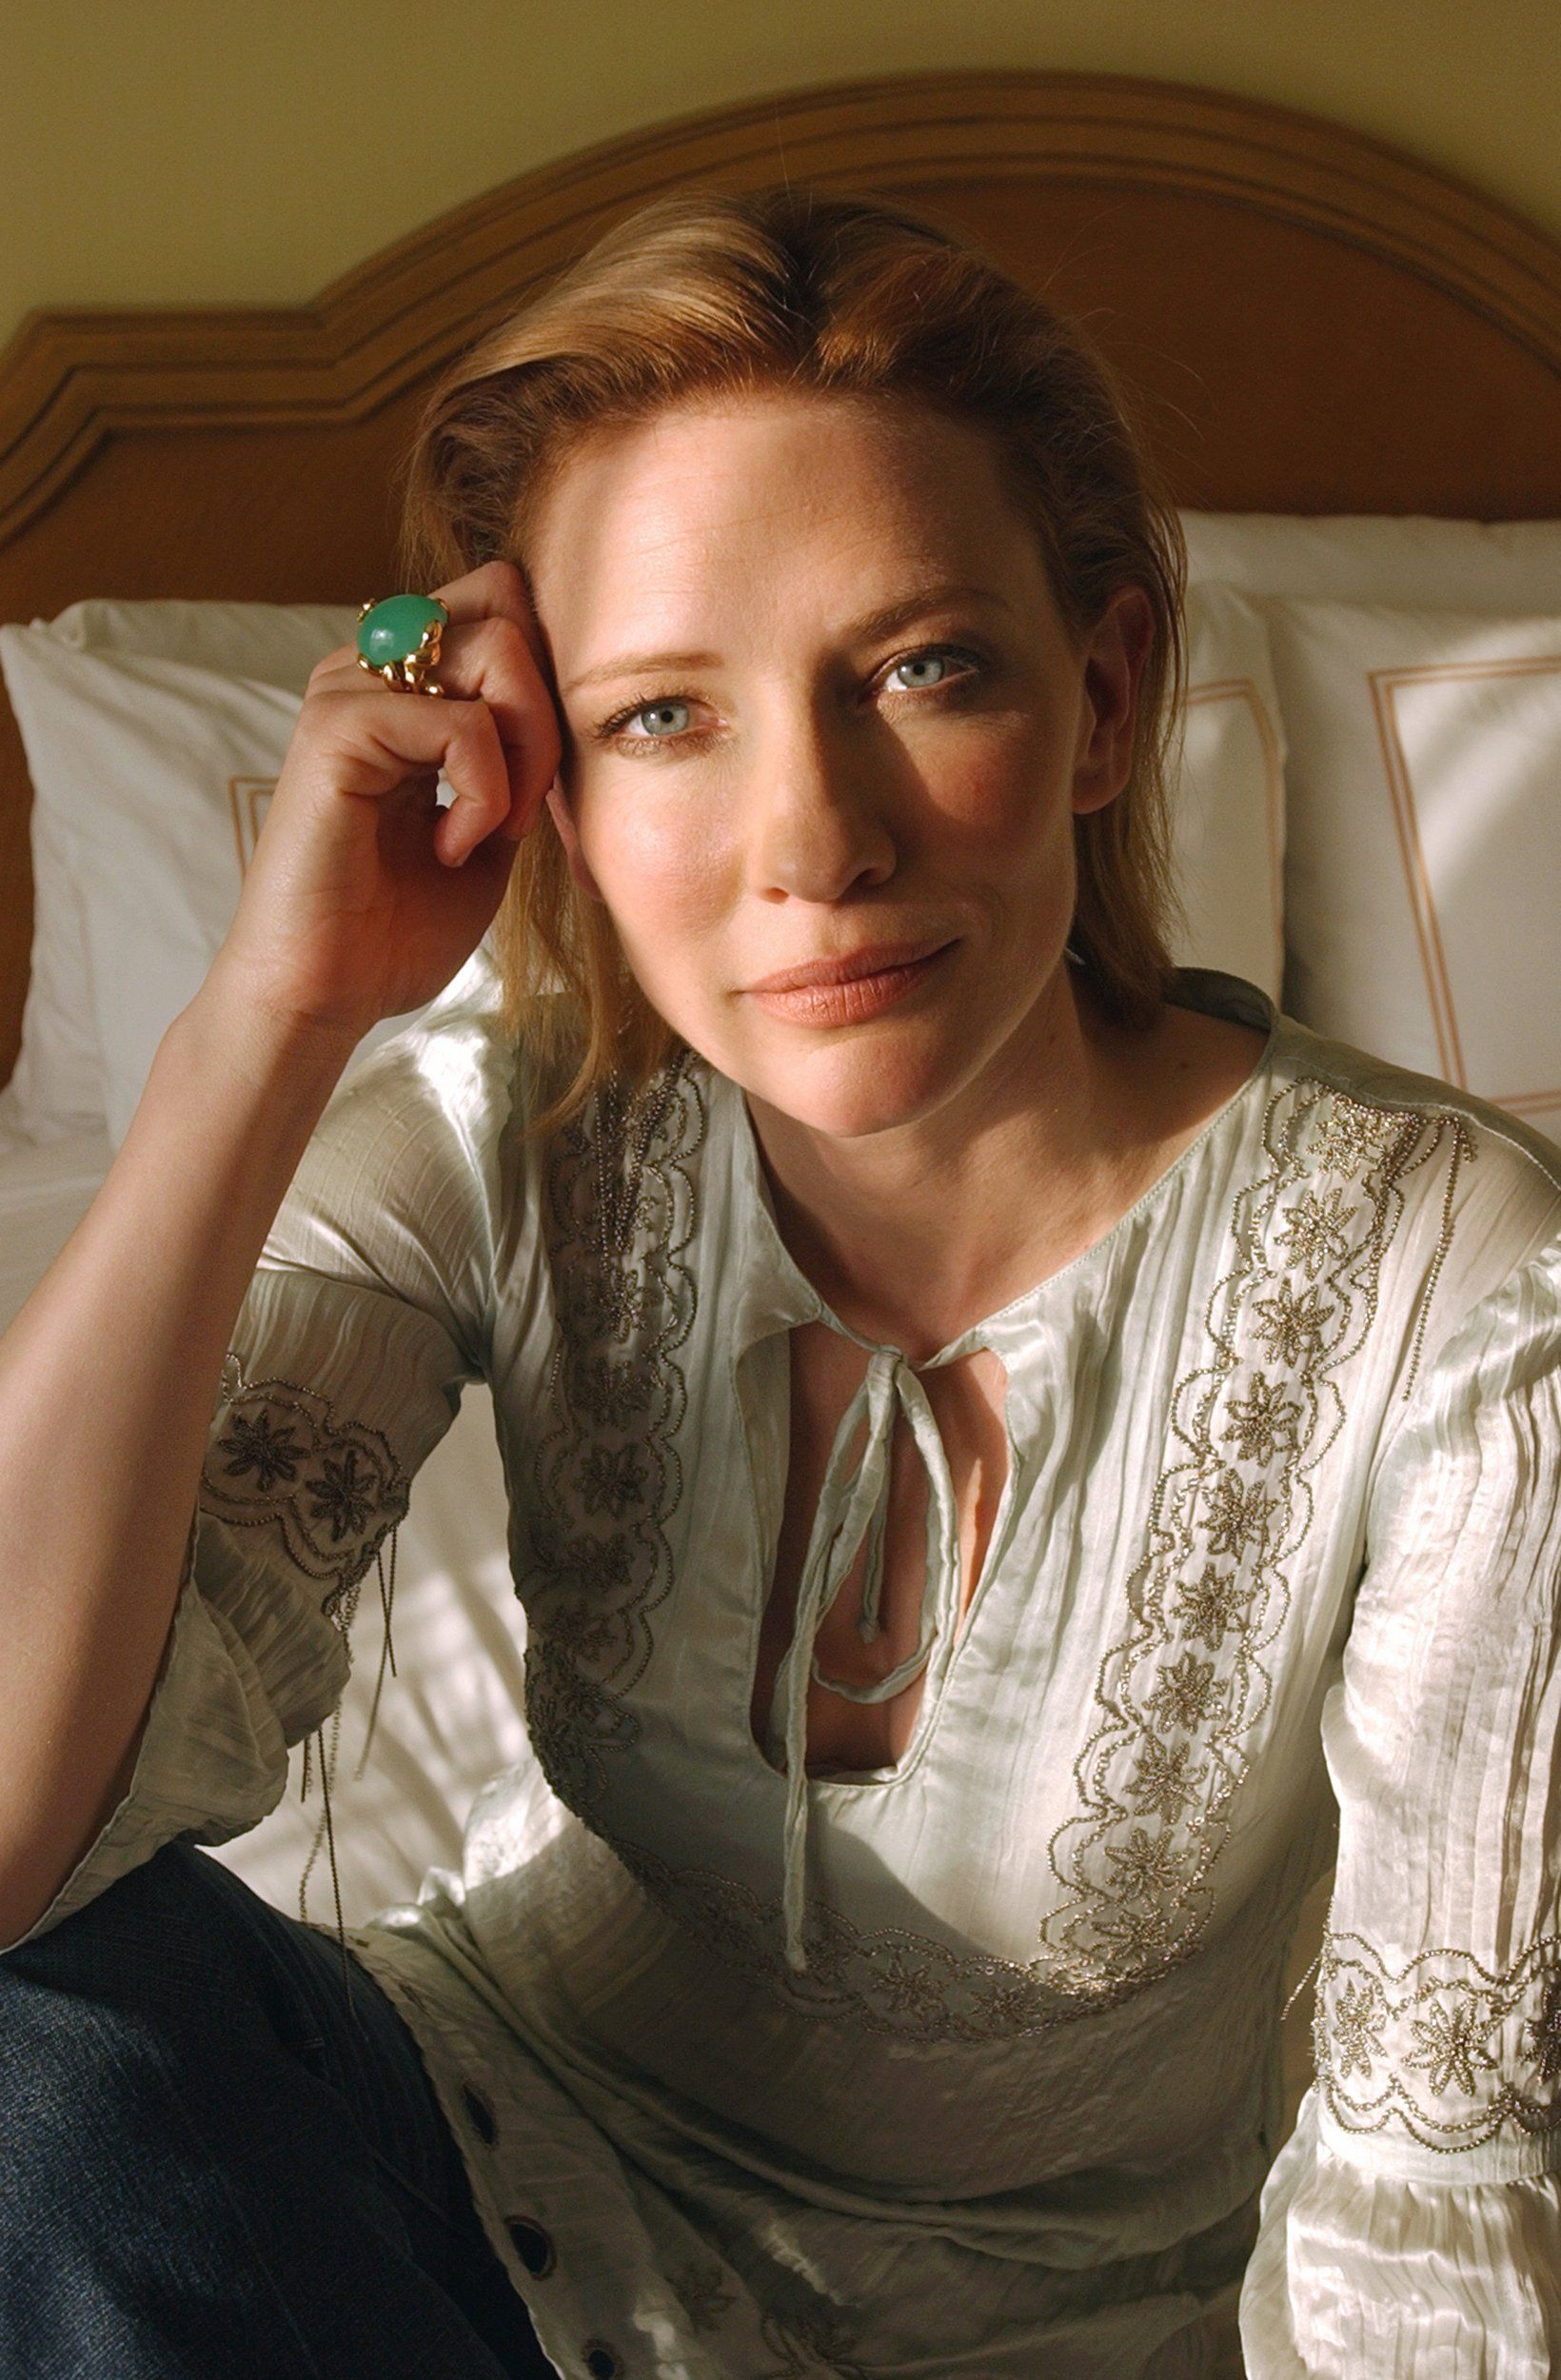 006 Vogue Australia 020 Cate Blanchett Fan Cate Blanchett